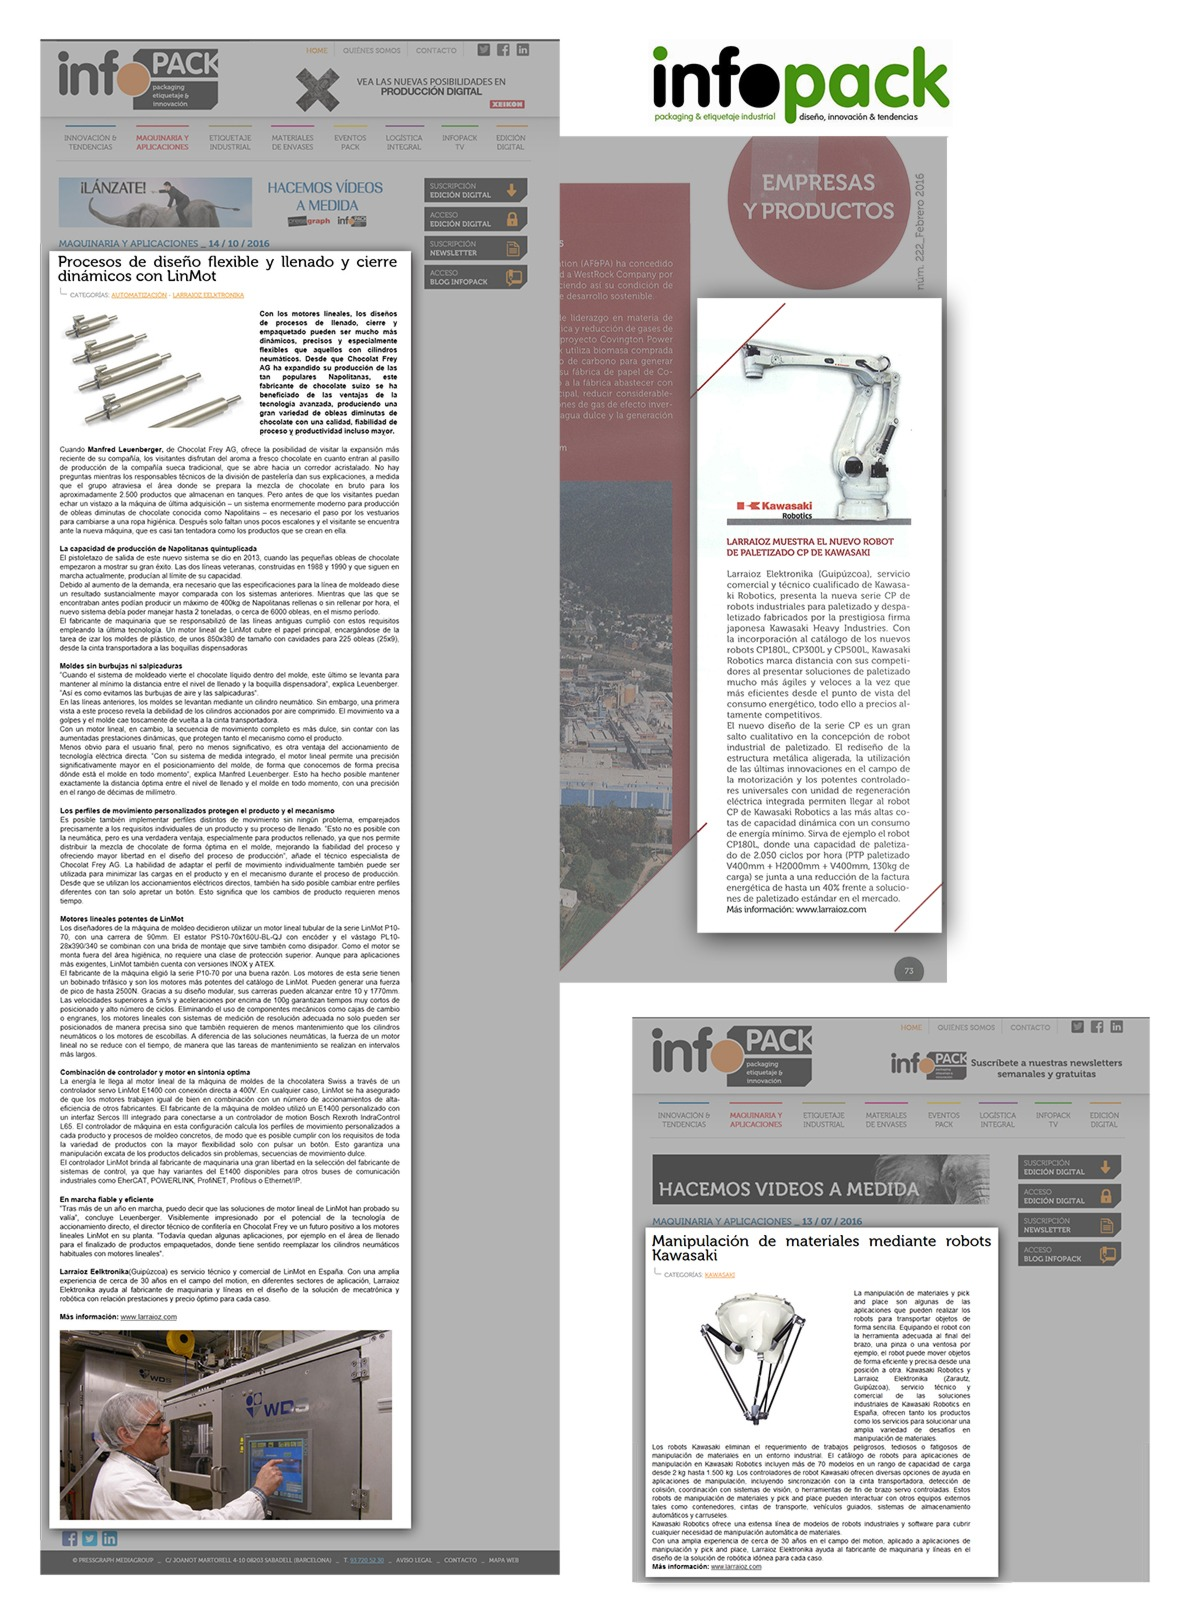 Cliping Larraioz Elektronika en Infopack 2016